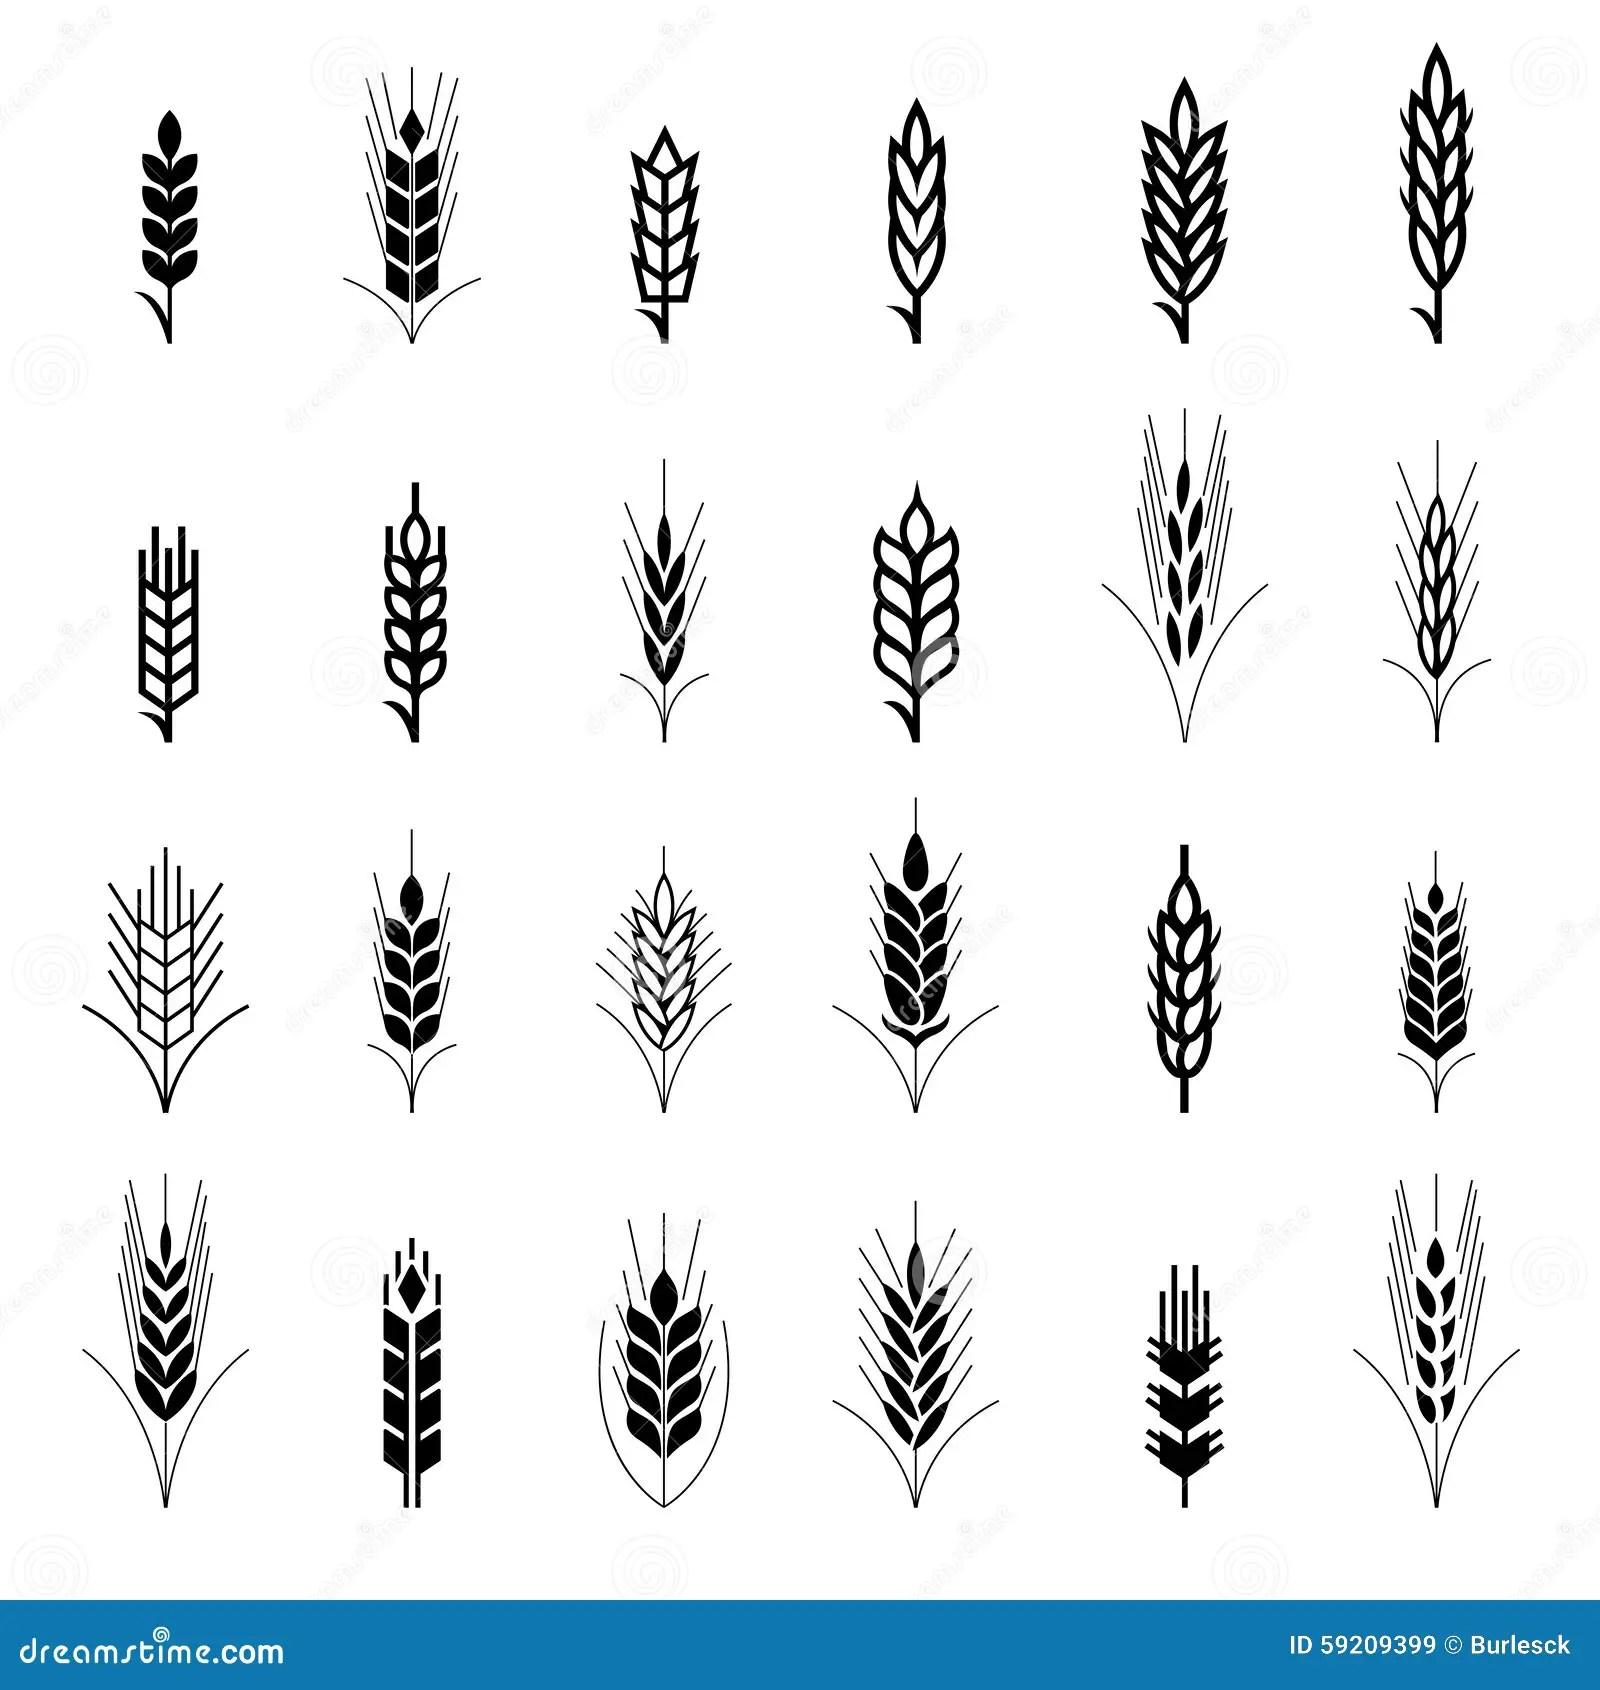 Wheat Ear Symbols For Logo Design Stock Vector